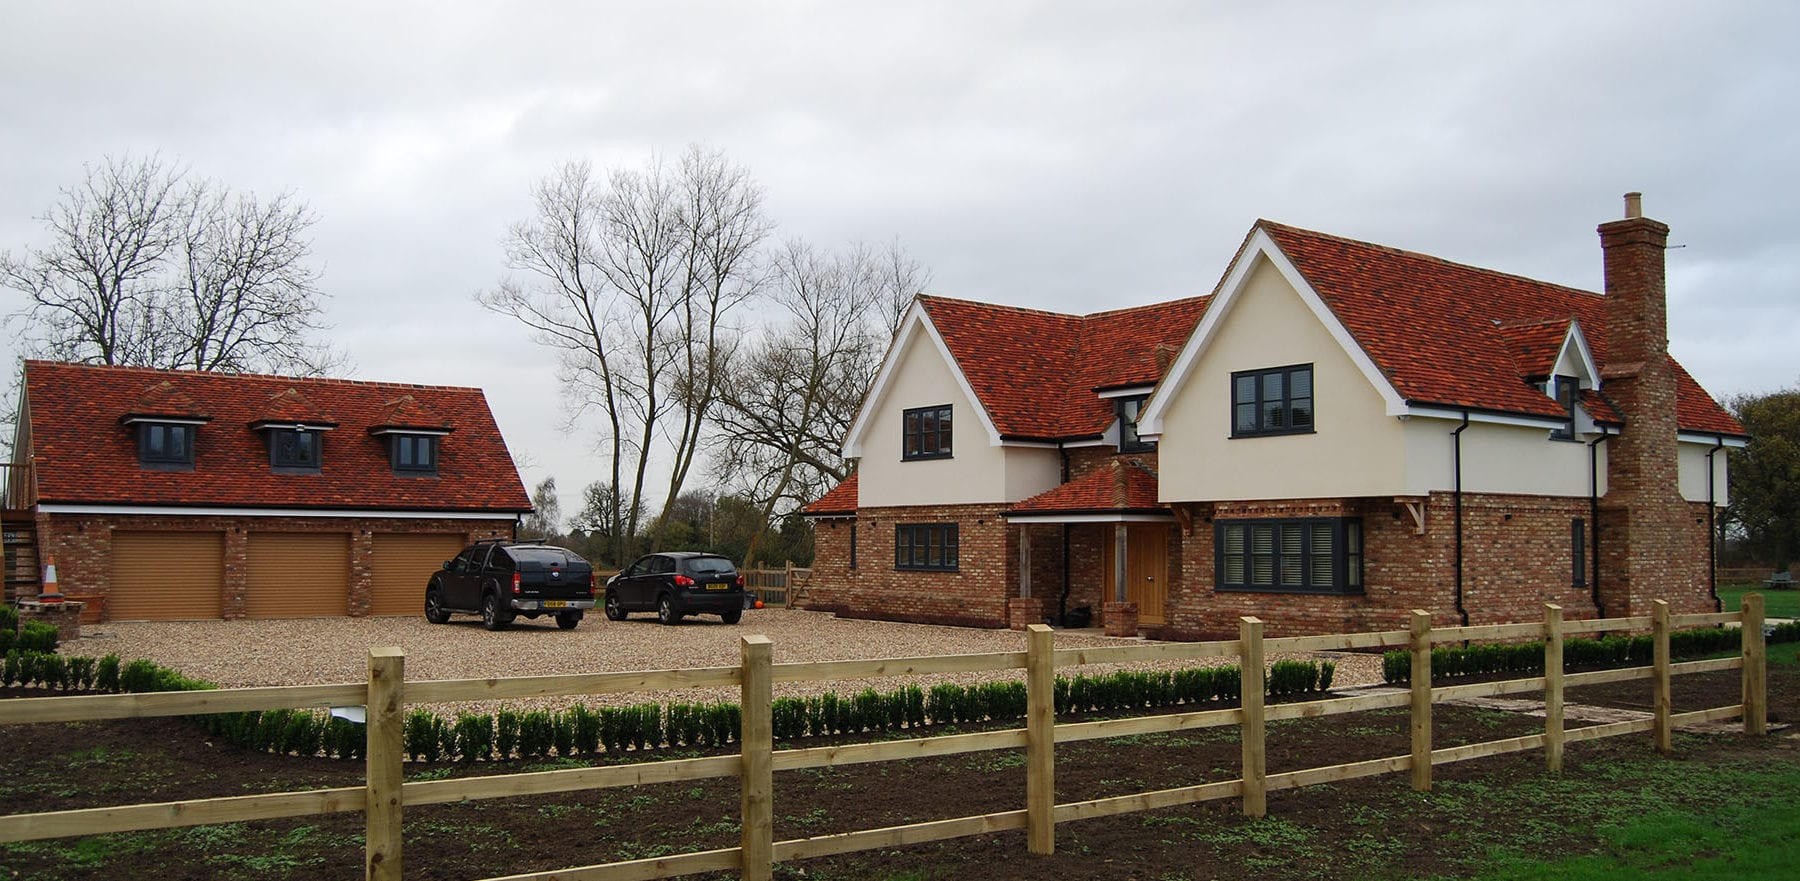 Lifestiles - Handmade Multi Clay Roof Tiles - Nazing, England 2